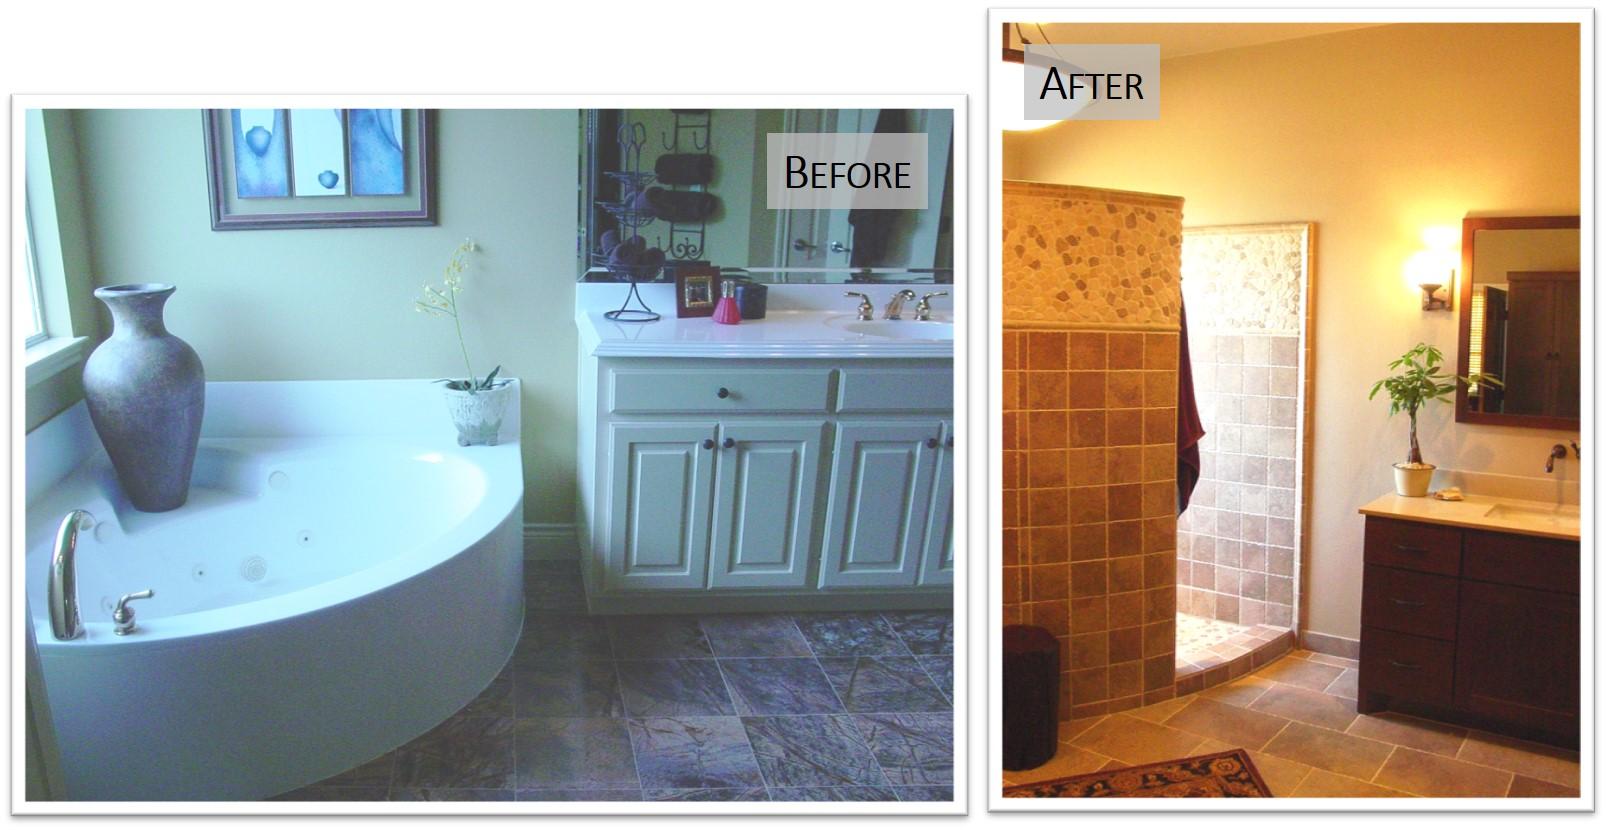 408 Lander, Shower1, Before and after, Bear Creek Homes.jpg